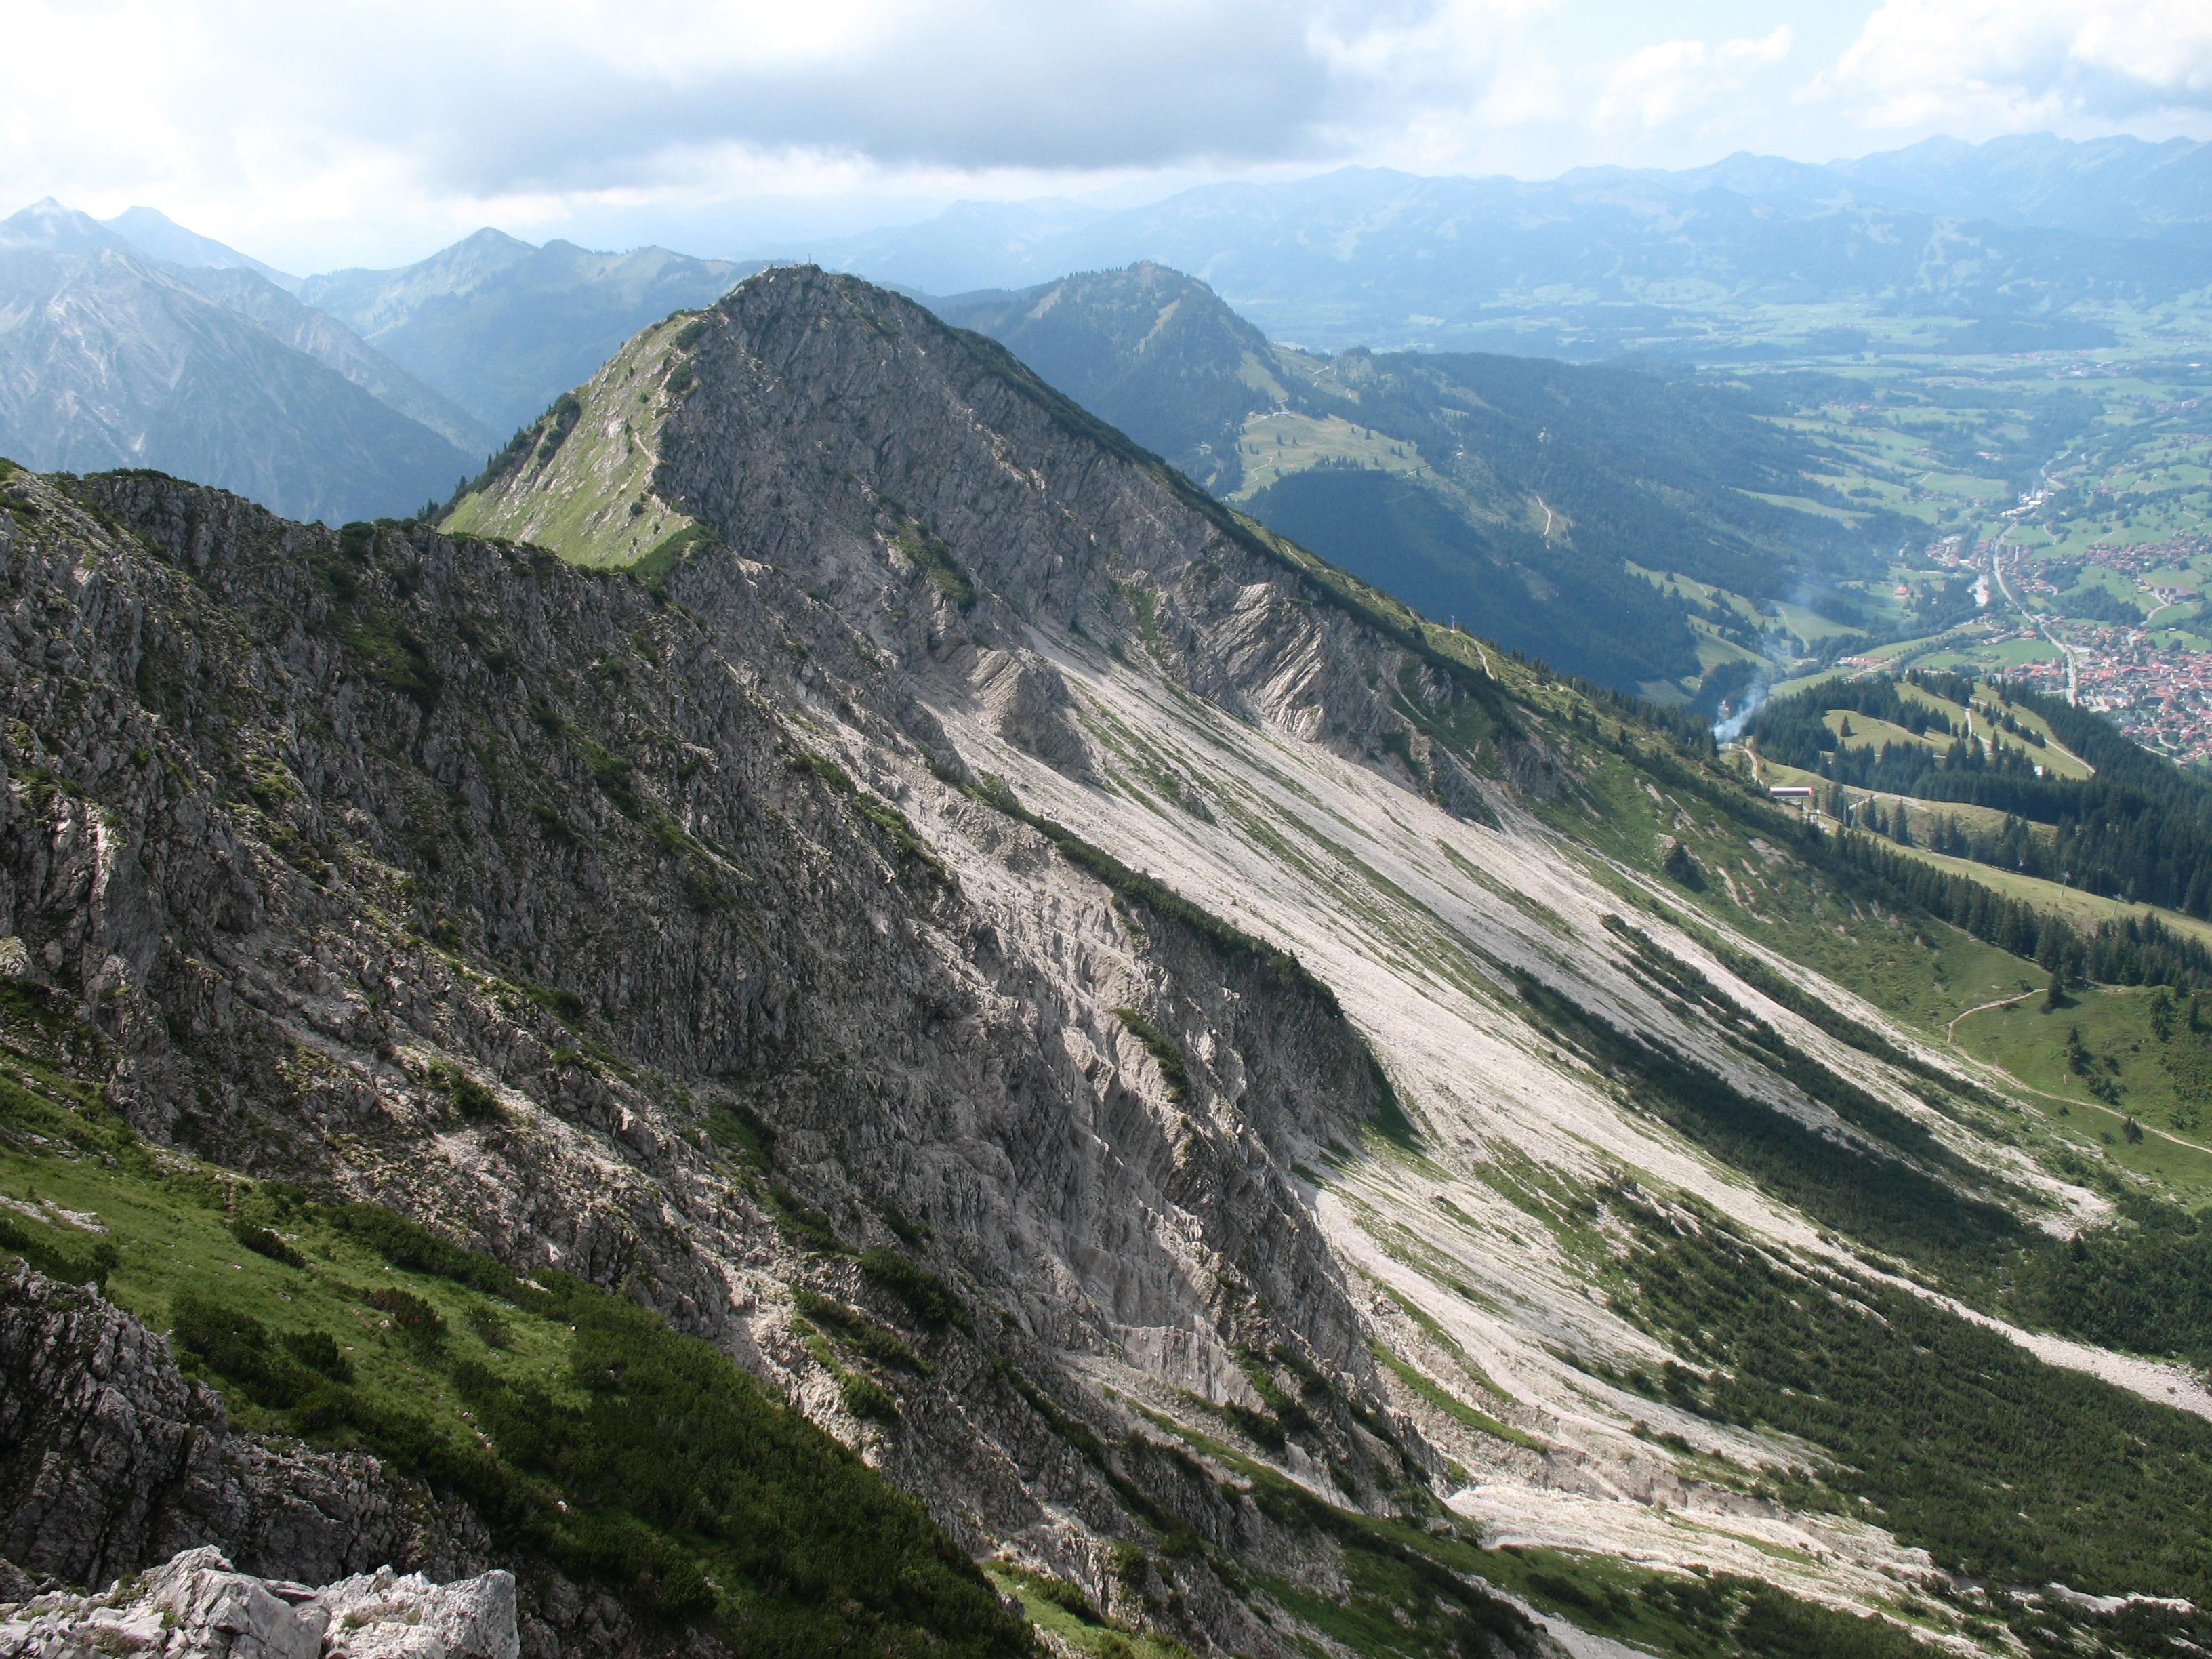 Klettersteig Iseler : Iseler u wikipedia